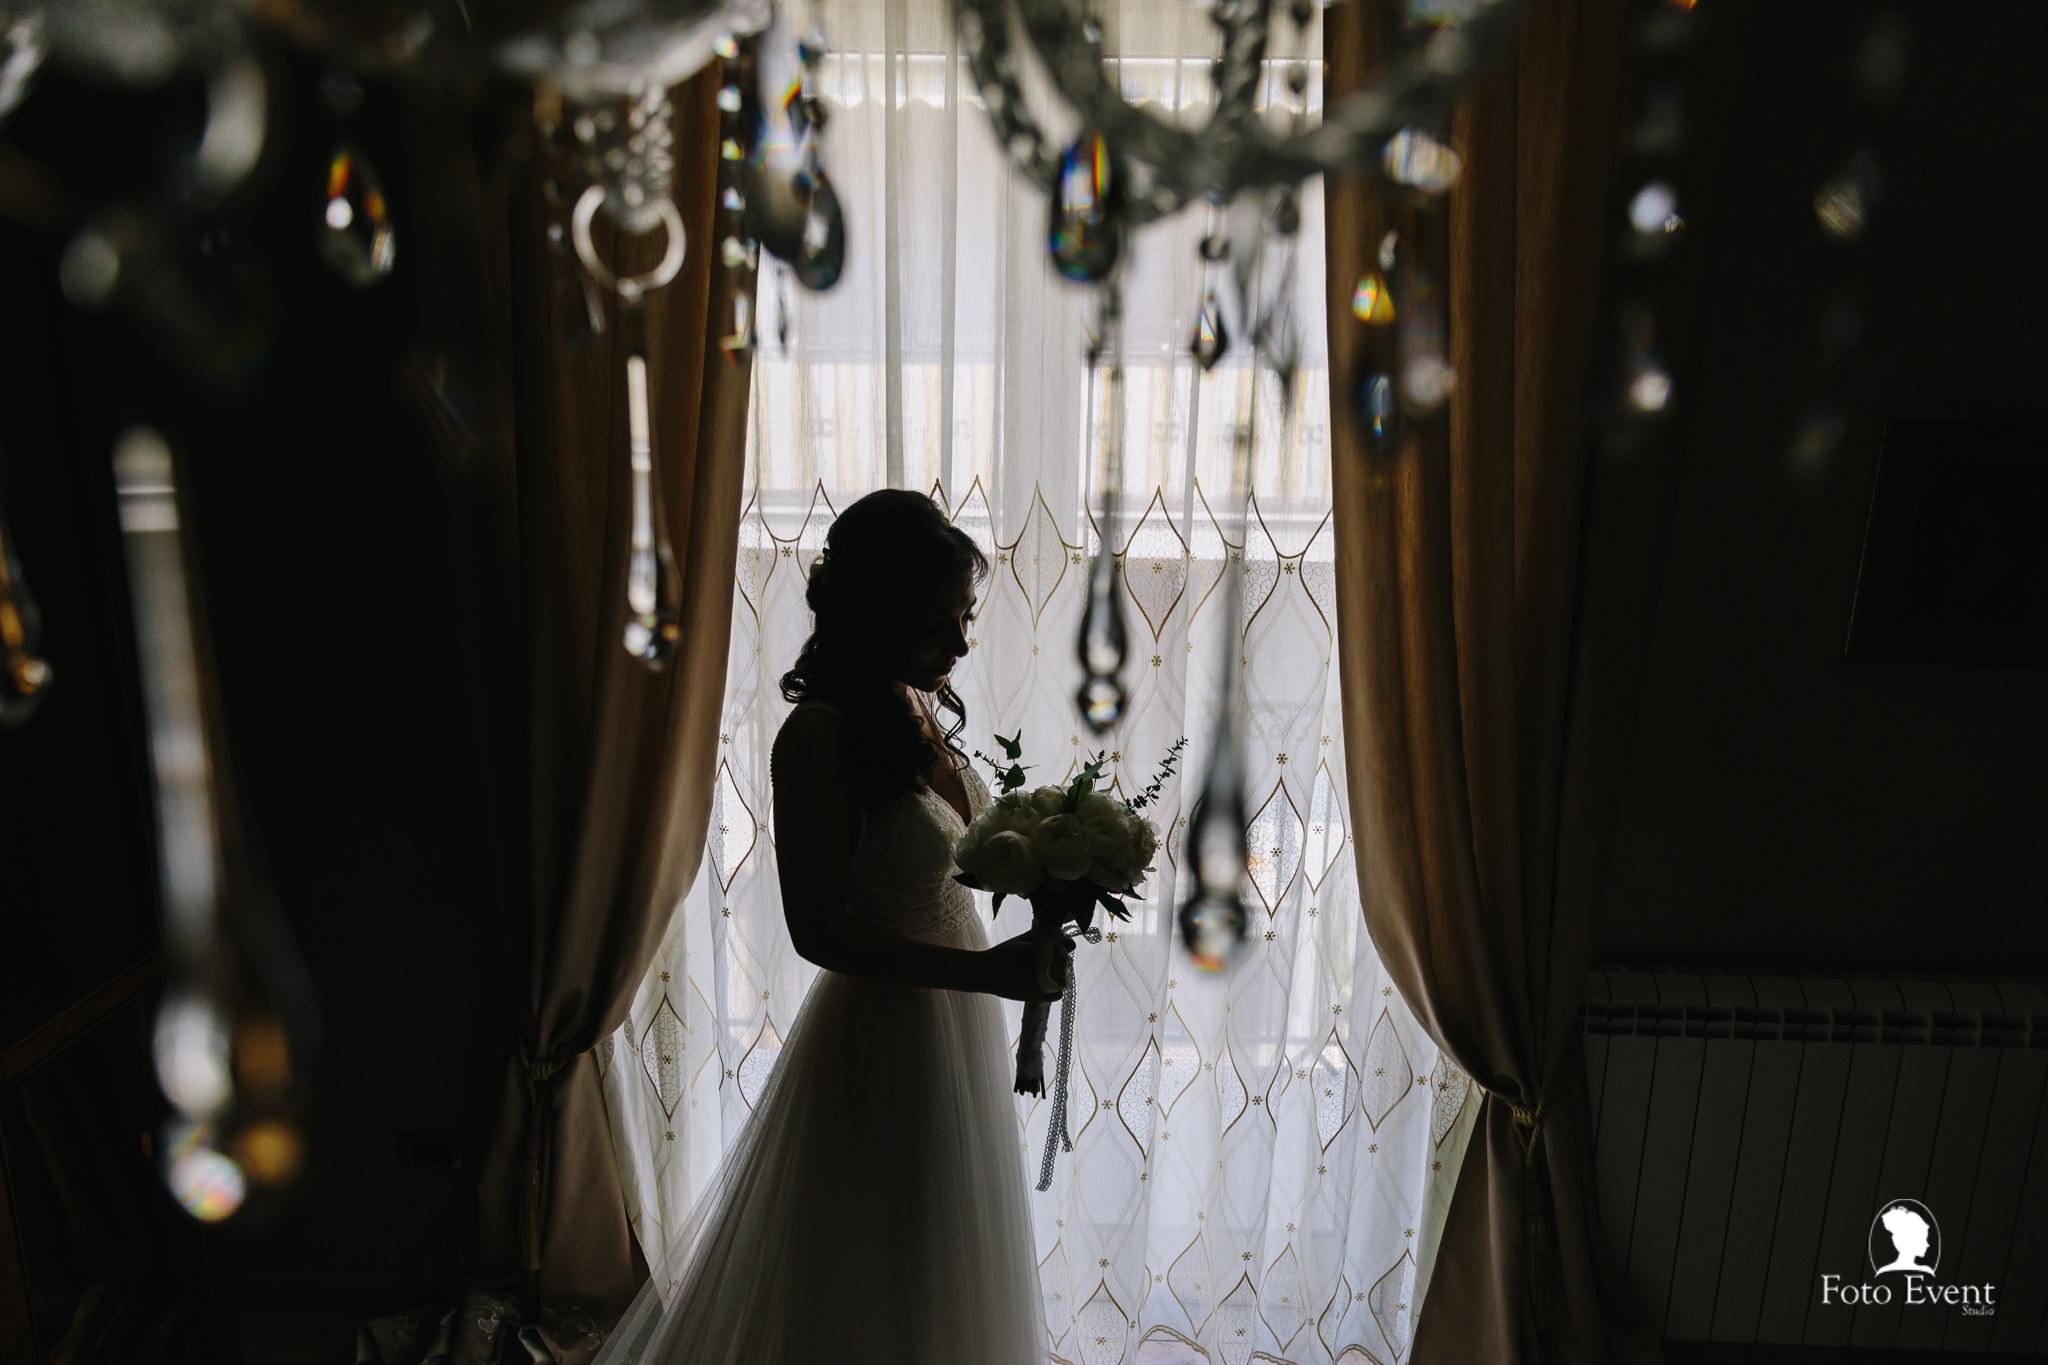 016-2019-08-23-Matrimonio-Lucia-e-Rosario-Scopelliti-5DE-882